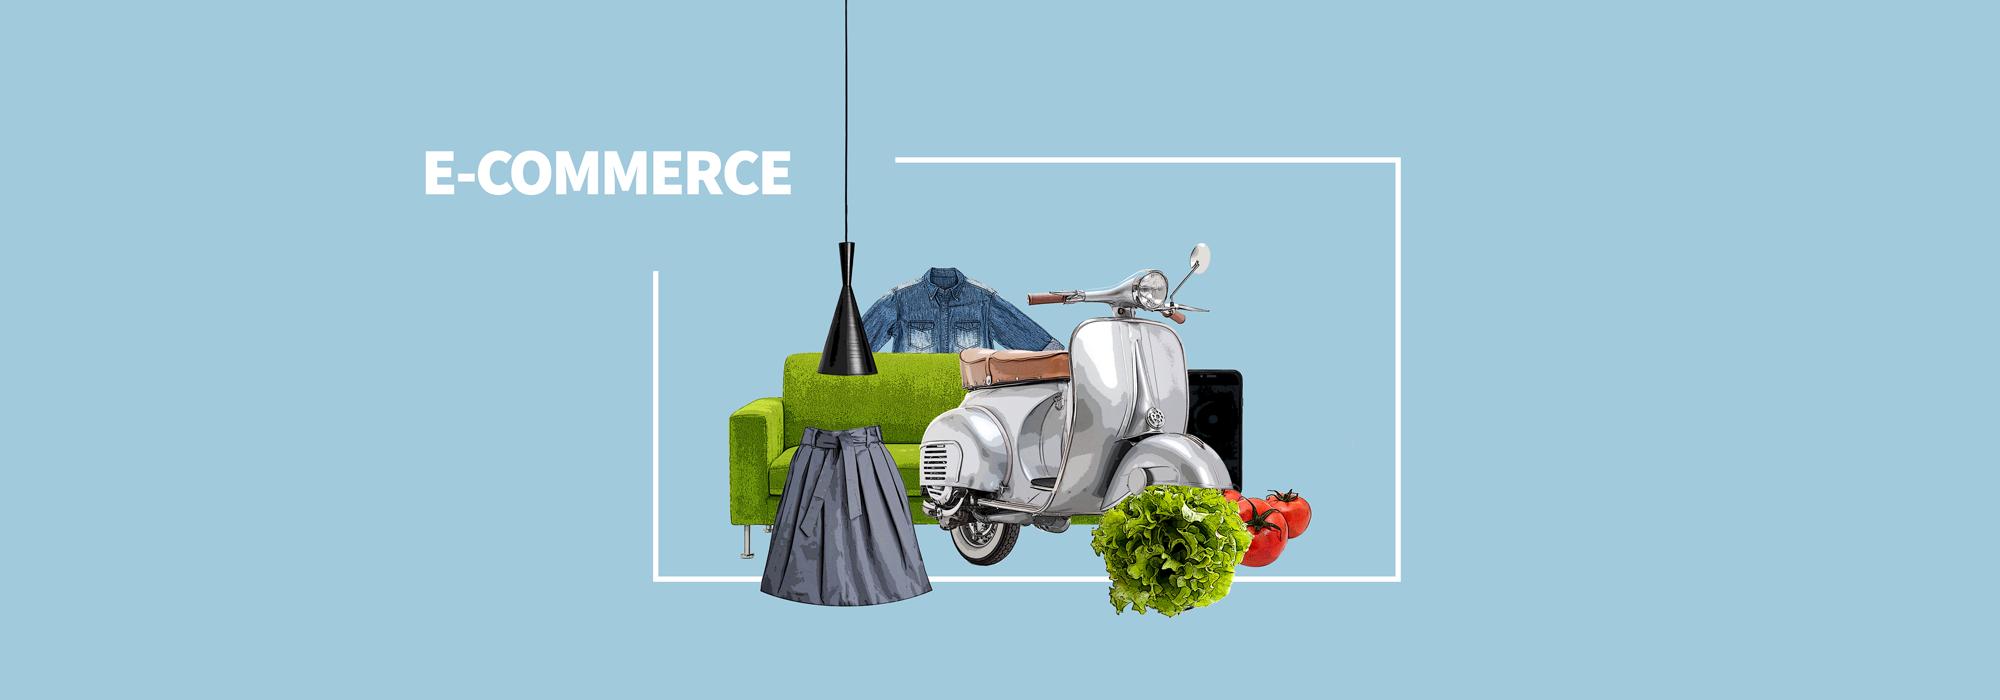 E-Commerce salva business